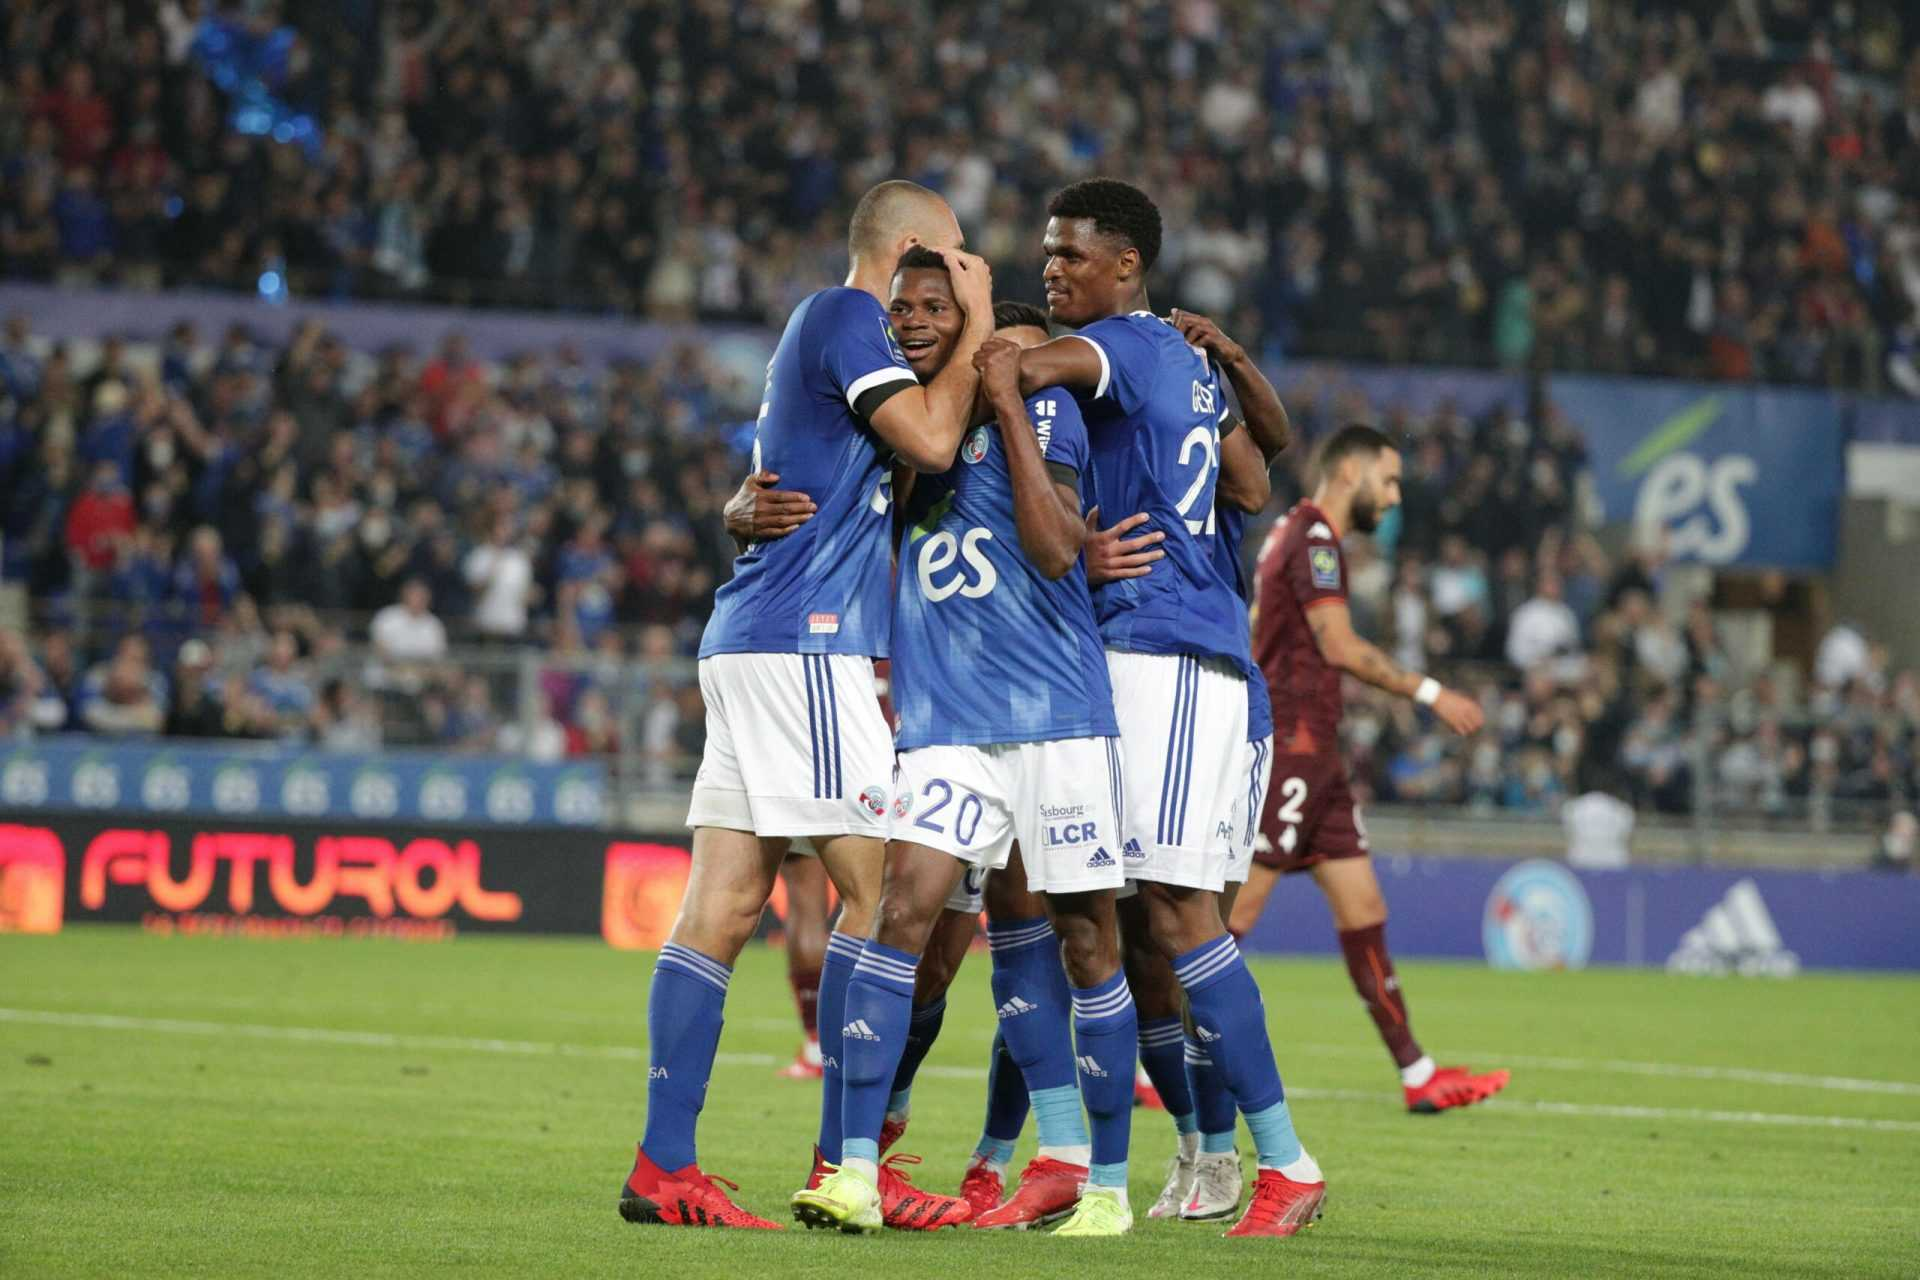 Ligue 1, giornata 6: vittoria PSG al 93', Marsiglia secondo